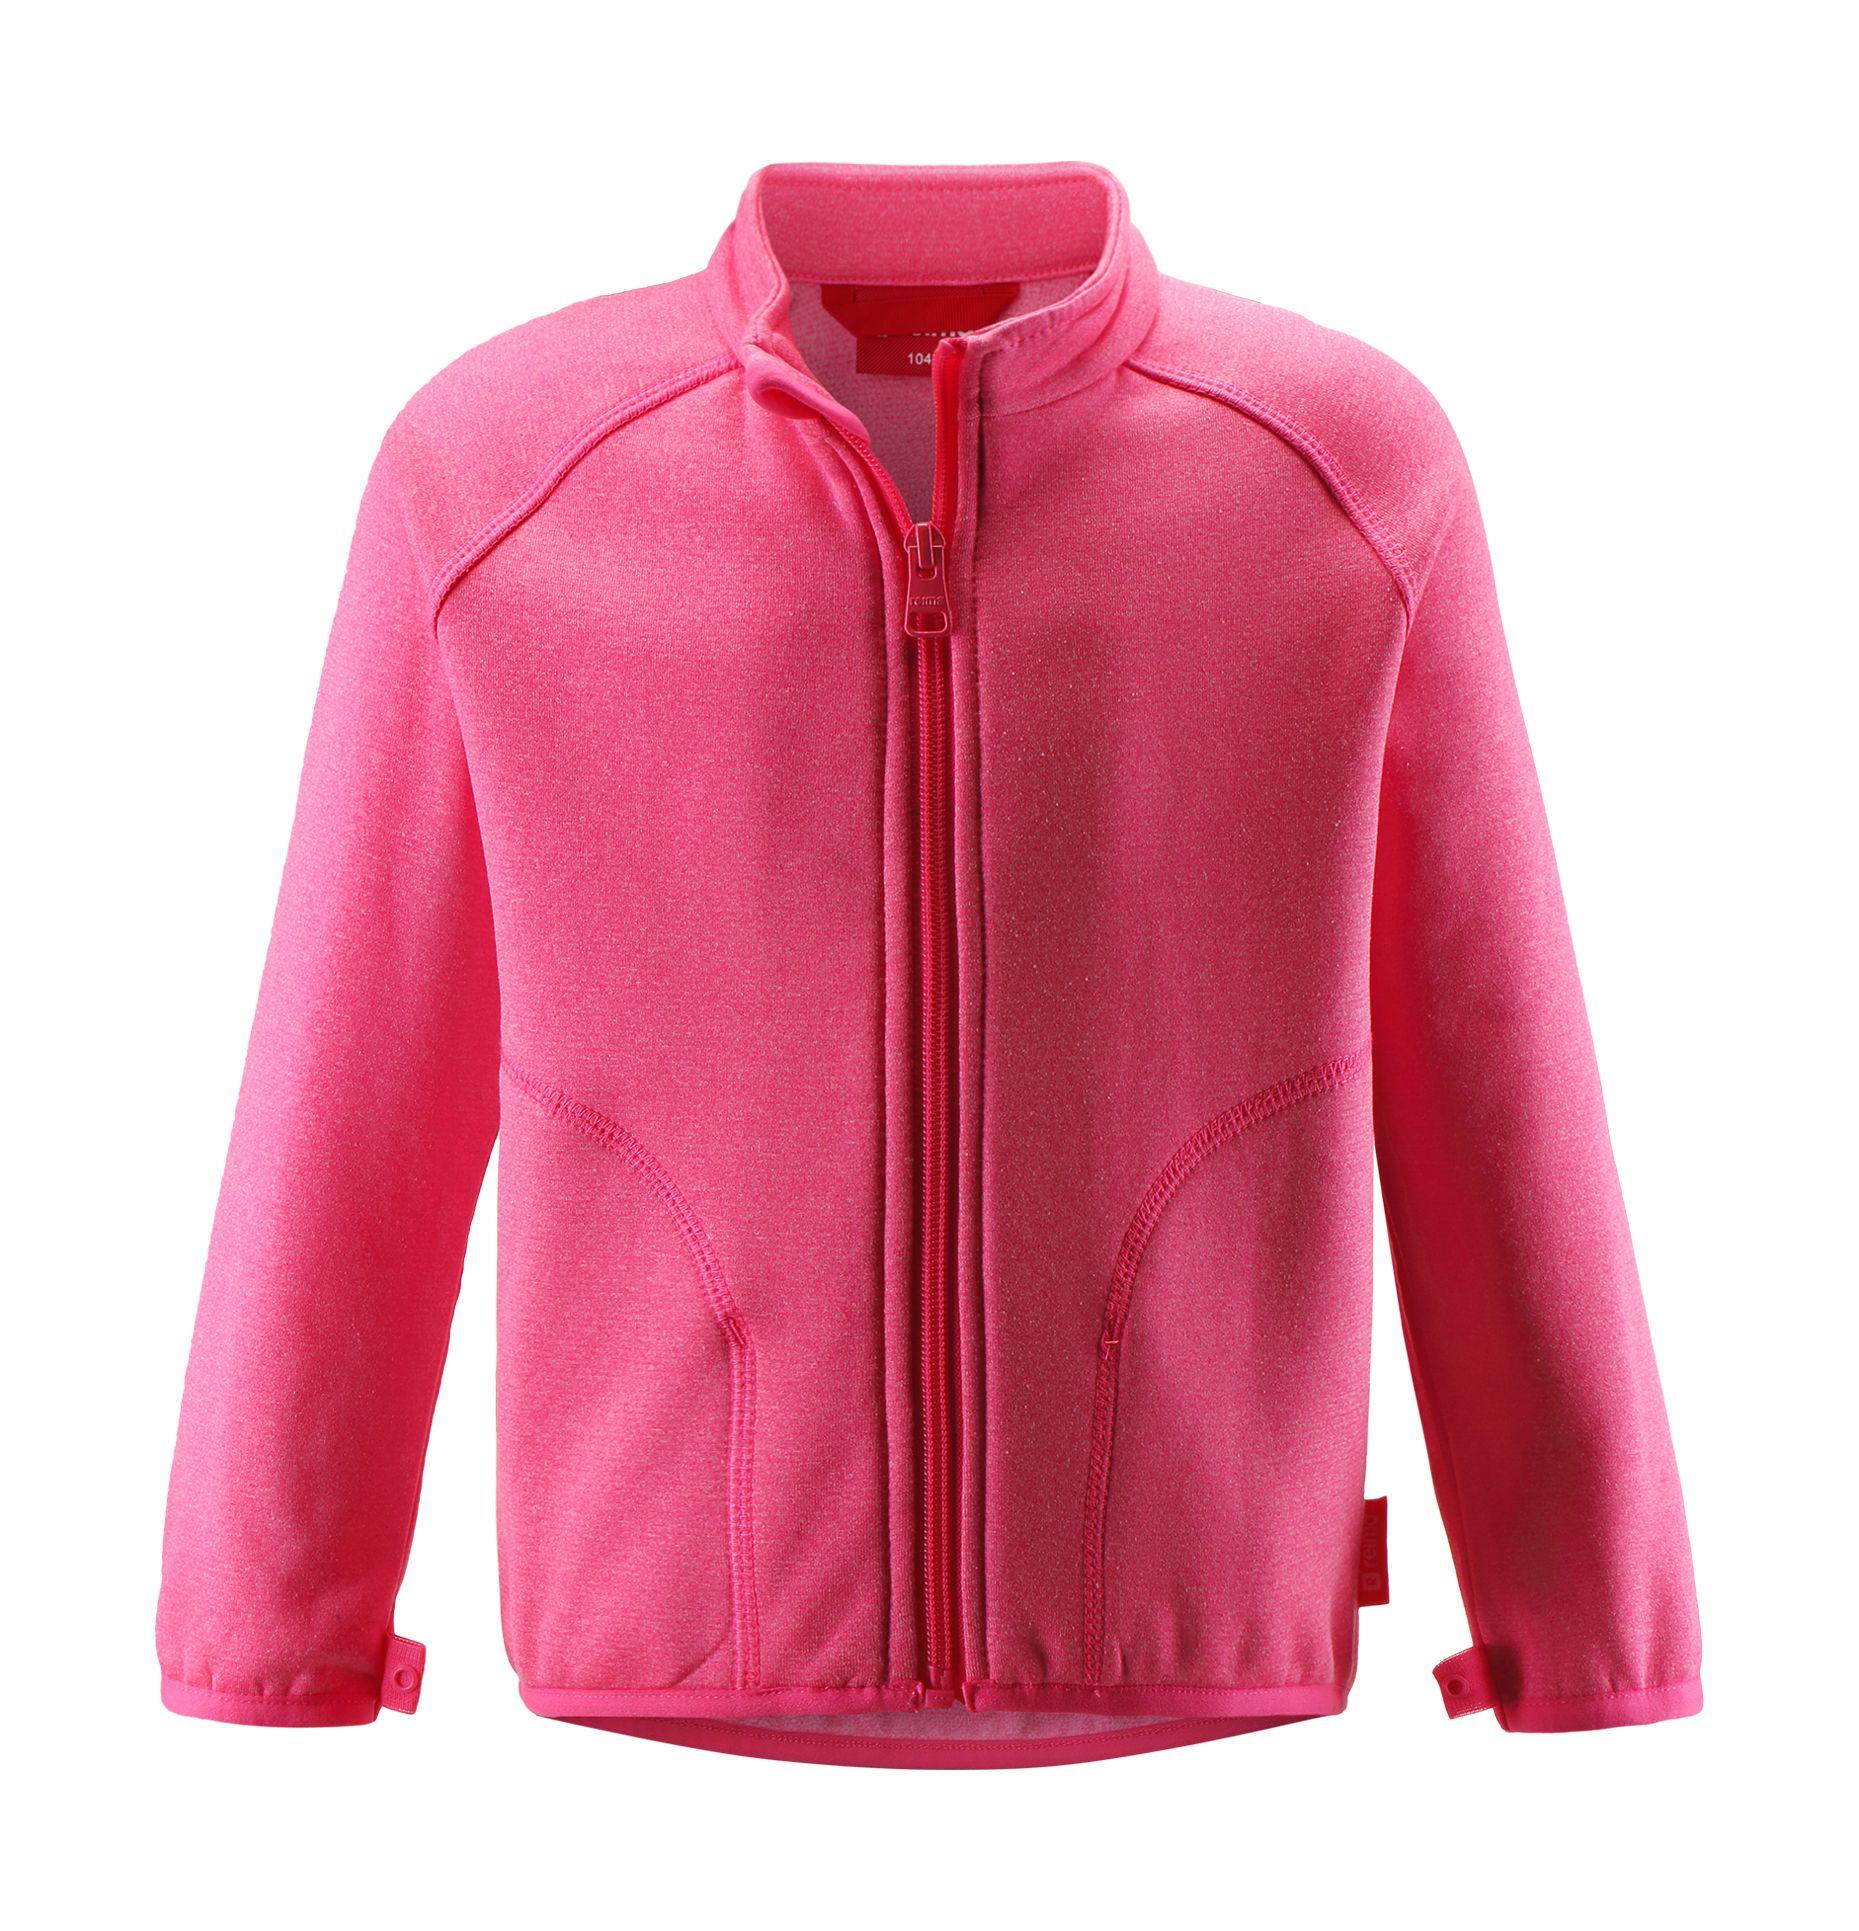 REIMA Klippe Candy Pink 104